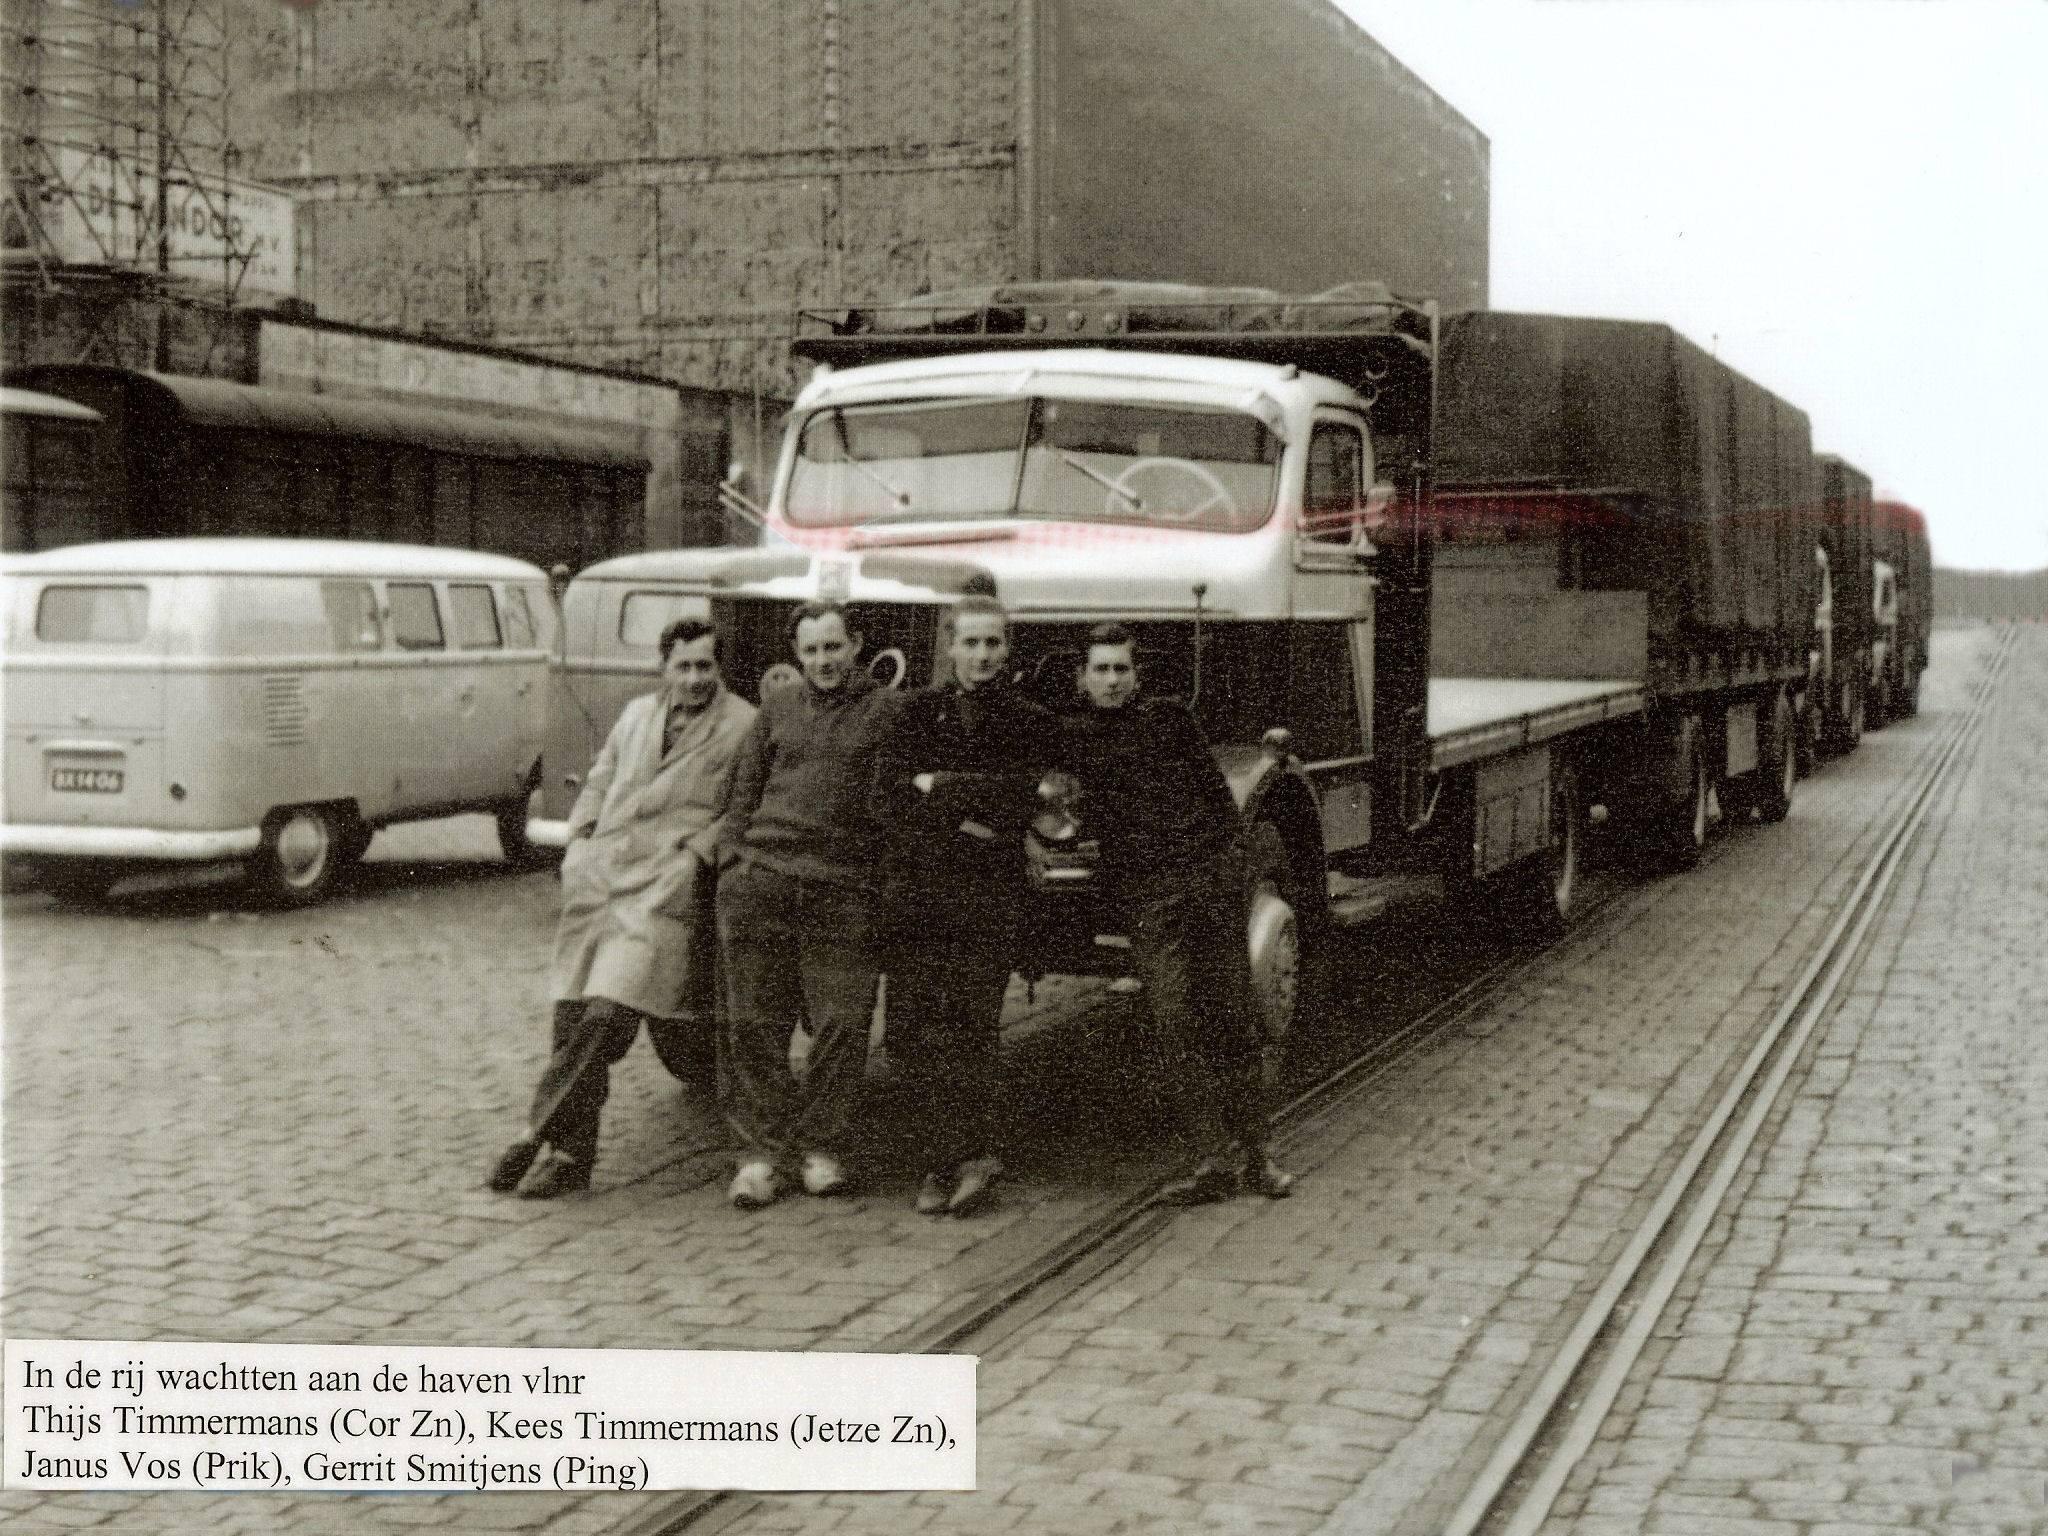 Timmermans-Transport-Veen-John-van-Andel-archief-2